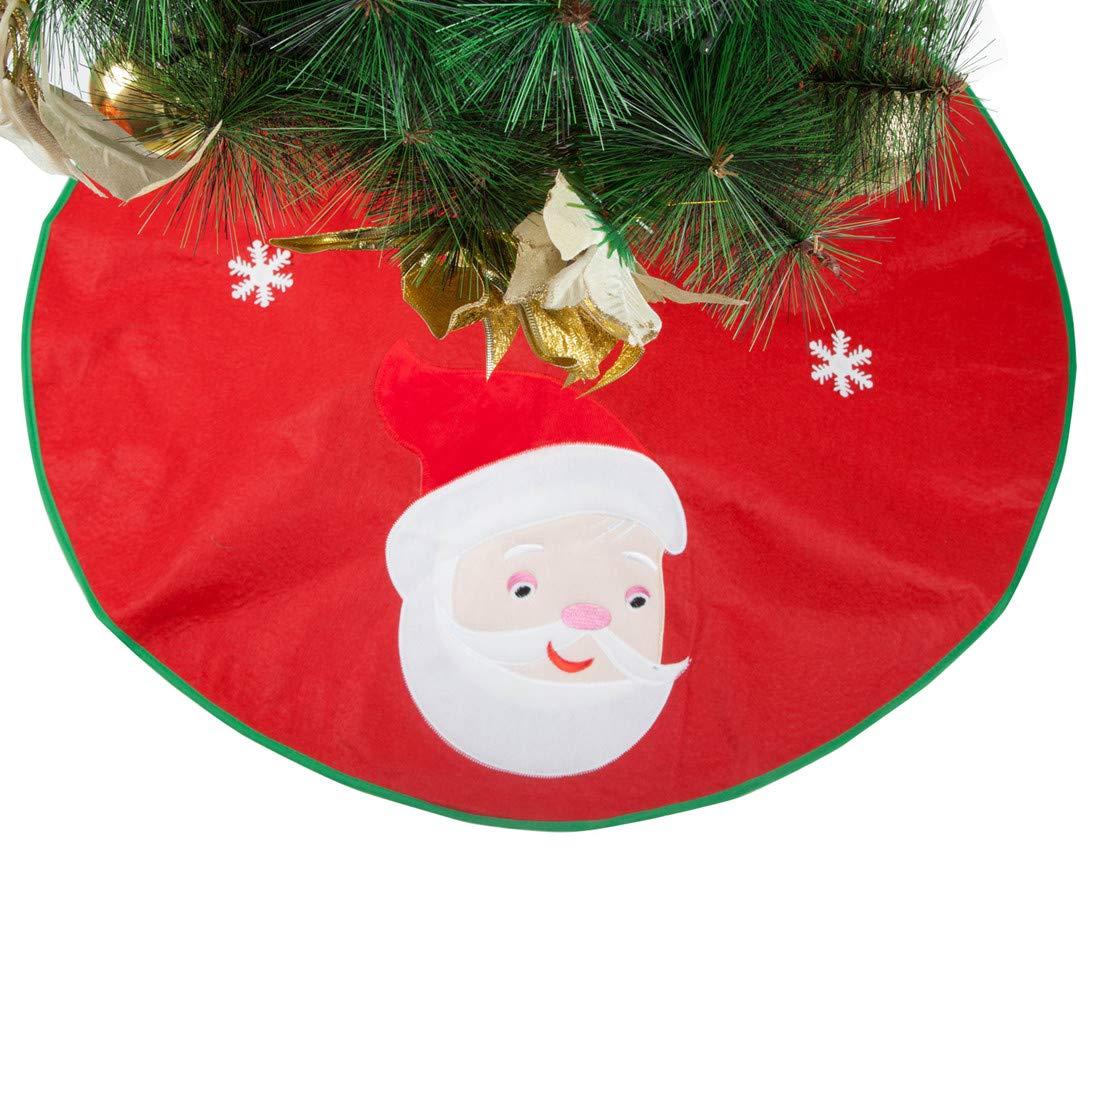 35 Inches Round Snowflake Santa Claus Tree Skirts for Xmas Christmas Party Holiday Decorations 2Pcs Christmas Tree Skirt